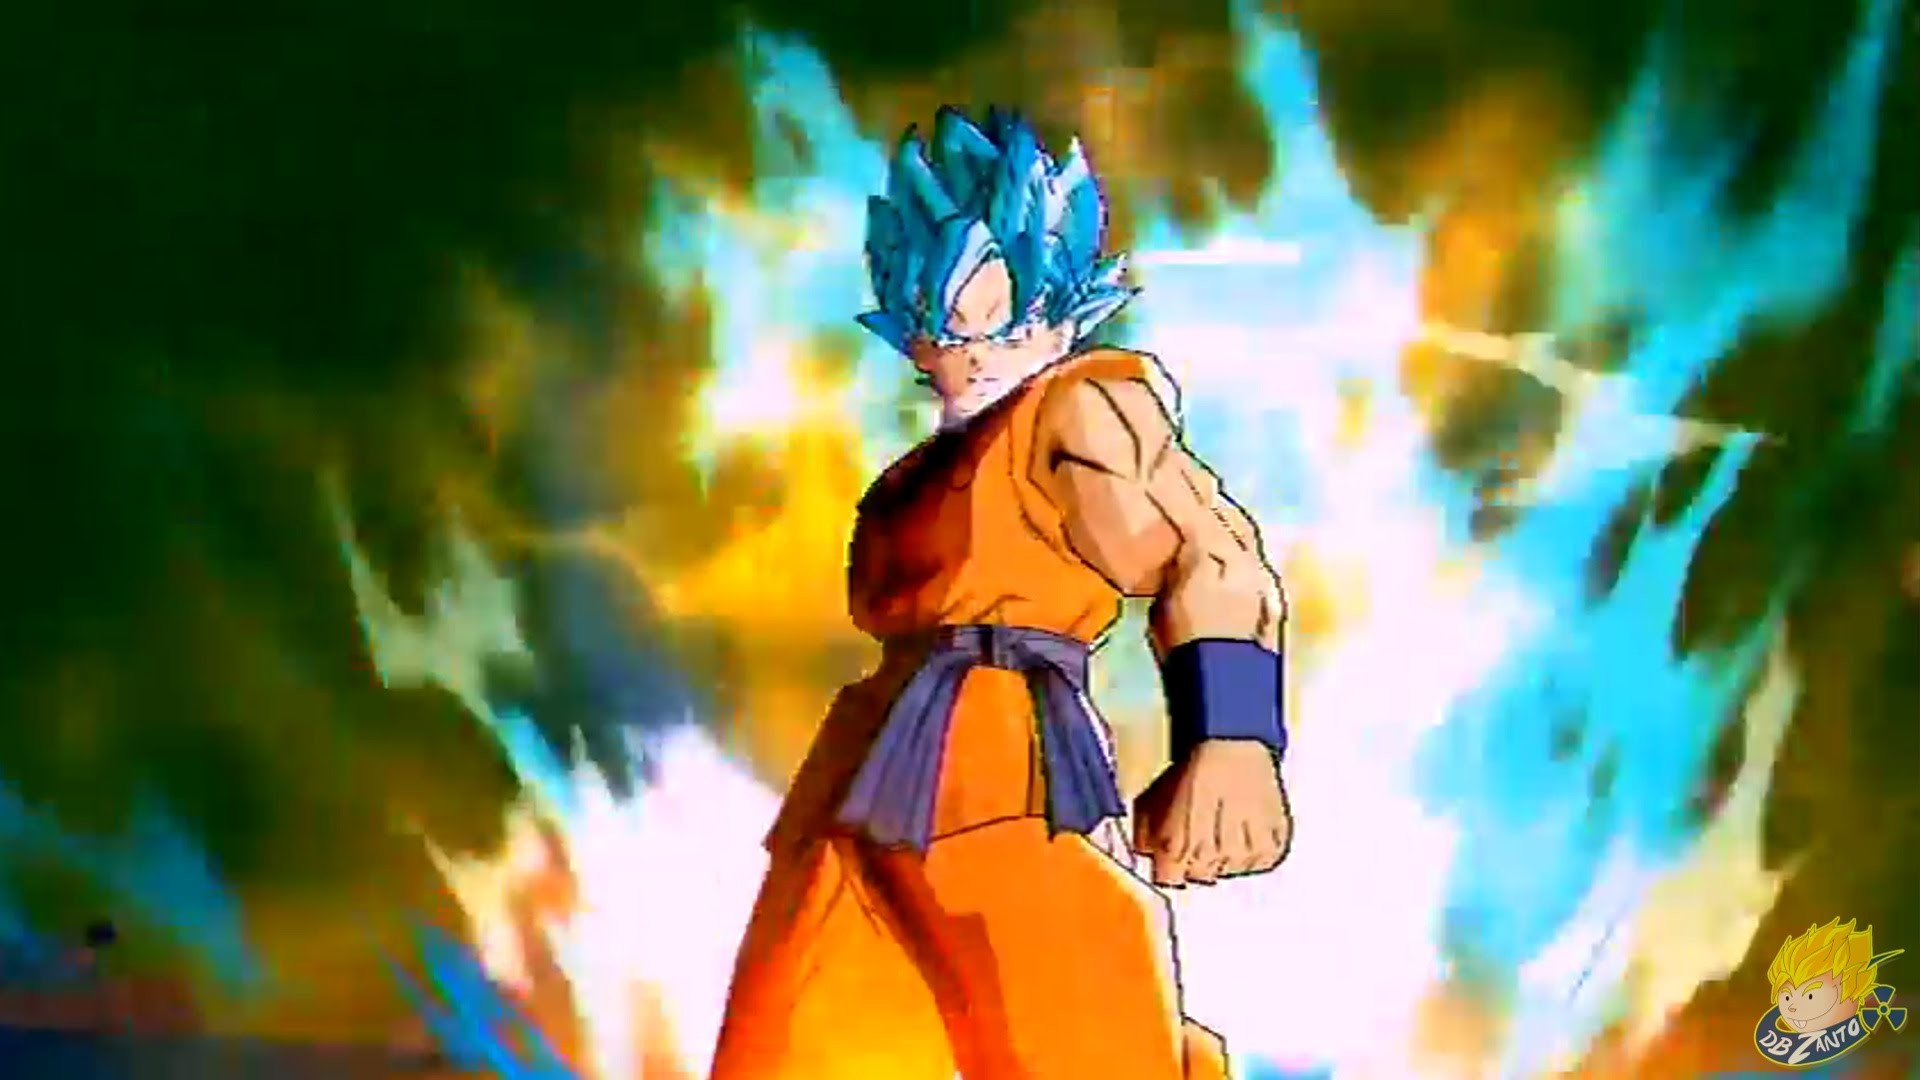 Dragon Ball Heroes: Goku's New Super Saiyan [SSGSS] Transformation  Revealed【FULL HD】 – YouTube